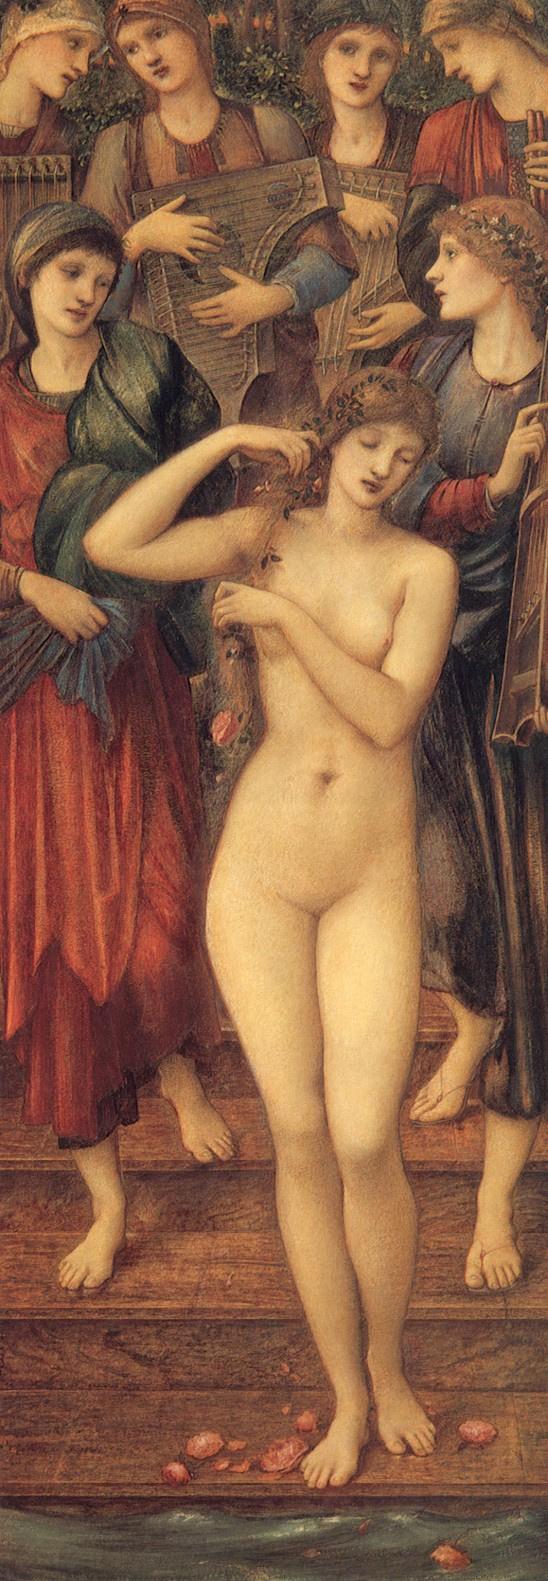 Edward Coley Burne-Jones. The Bath of Venus